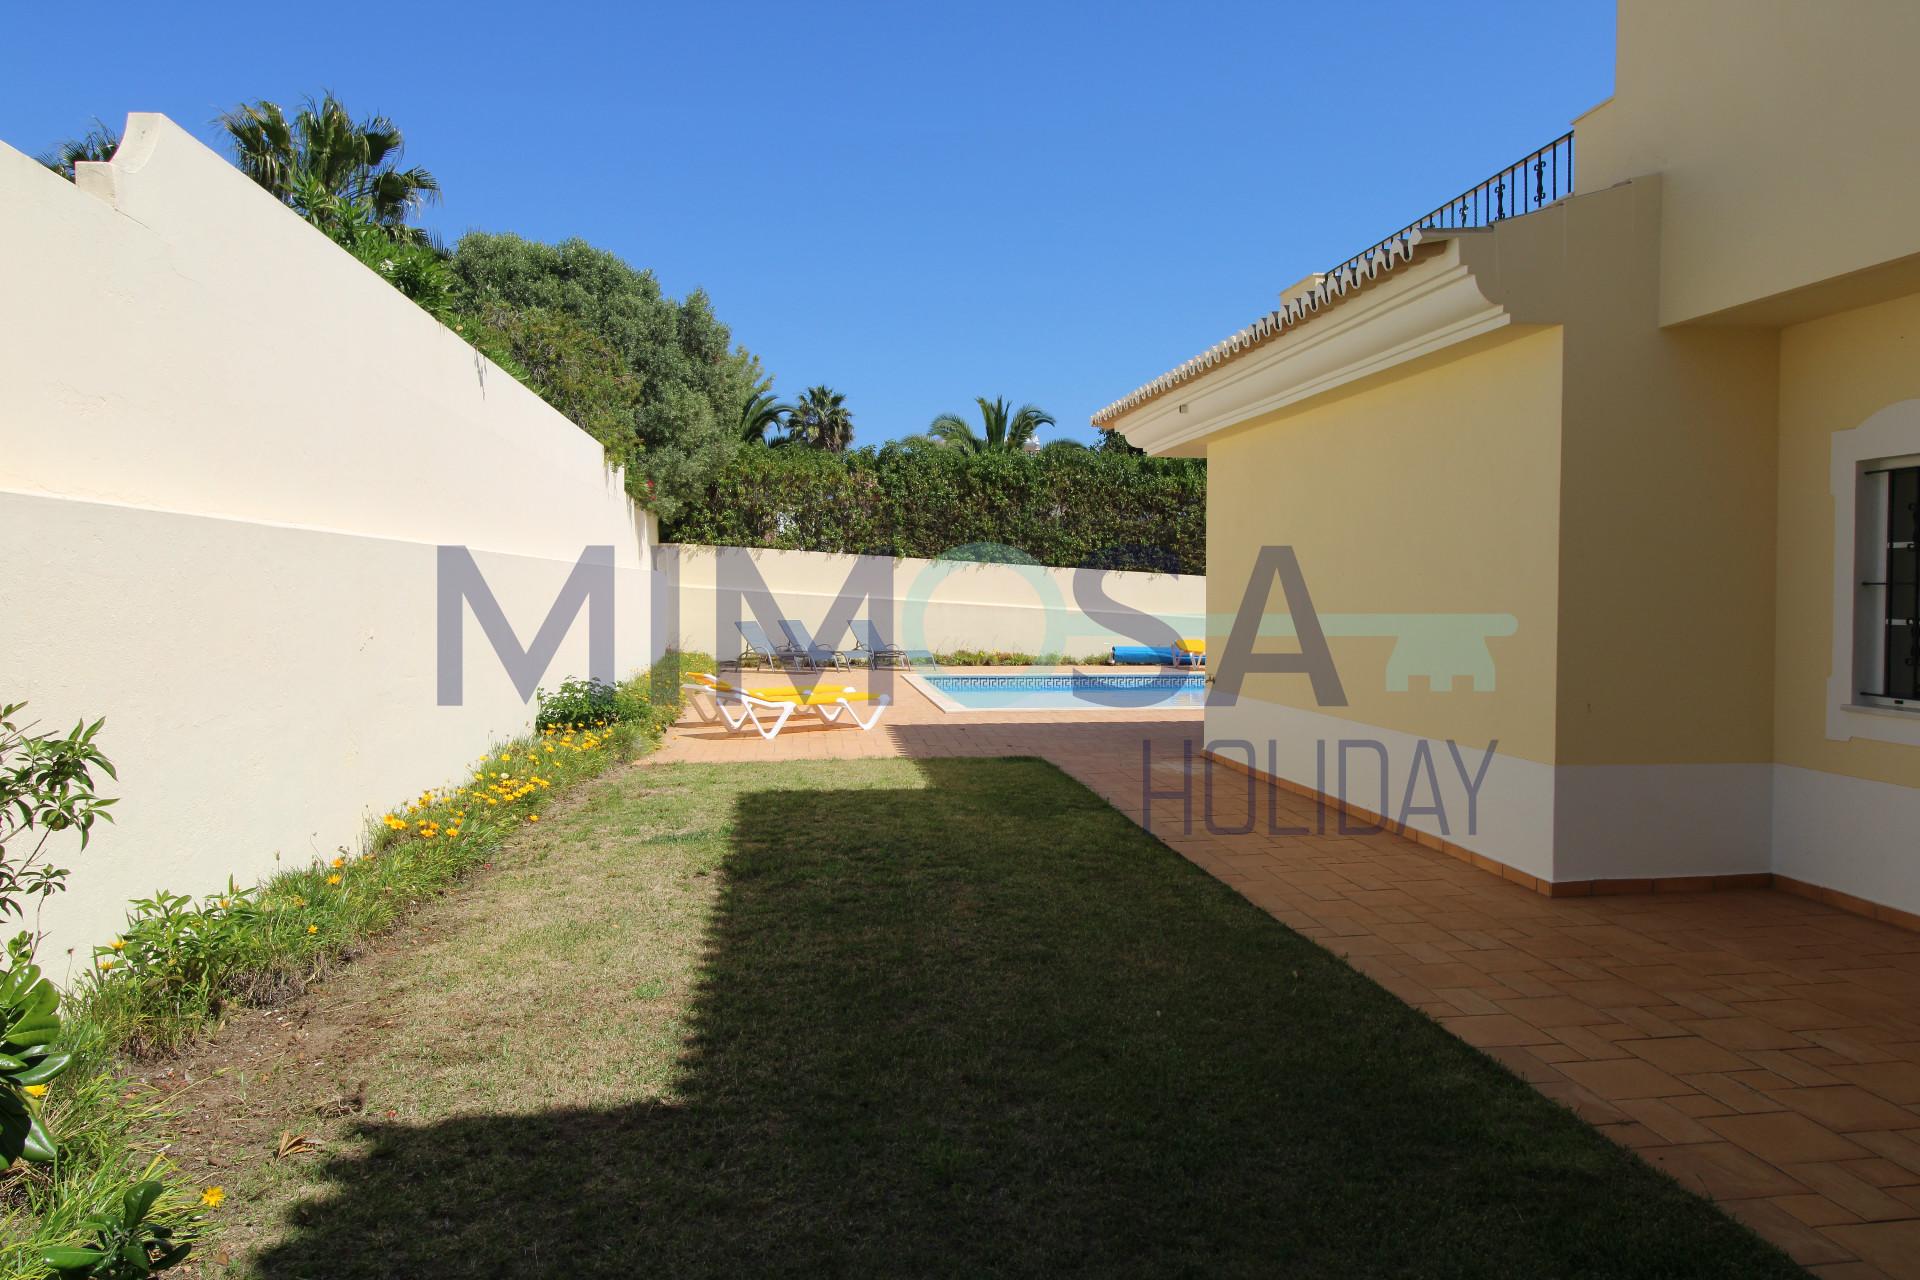 Fabulosa Moradia V4 com piscina na bonita zona da Praia da Luz